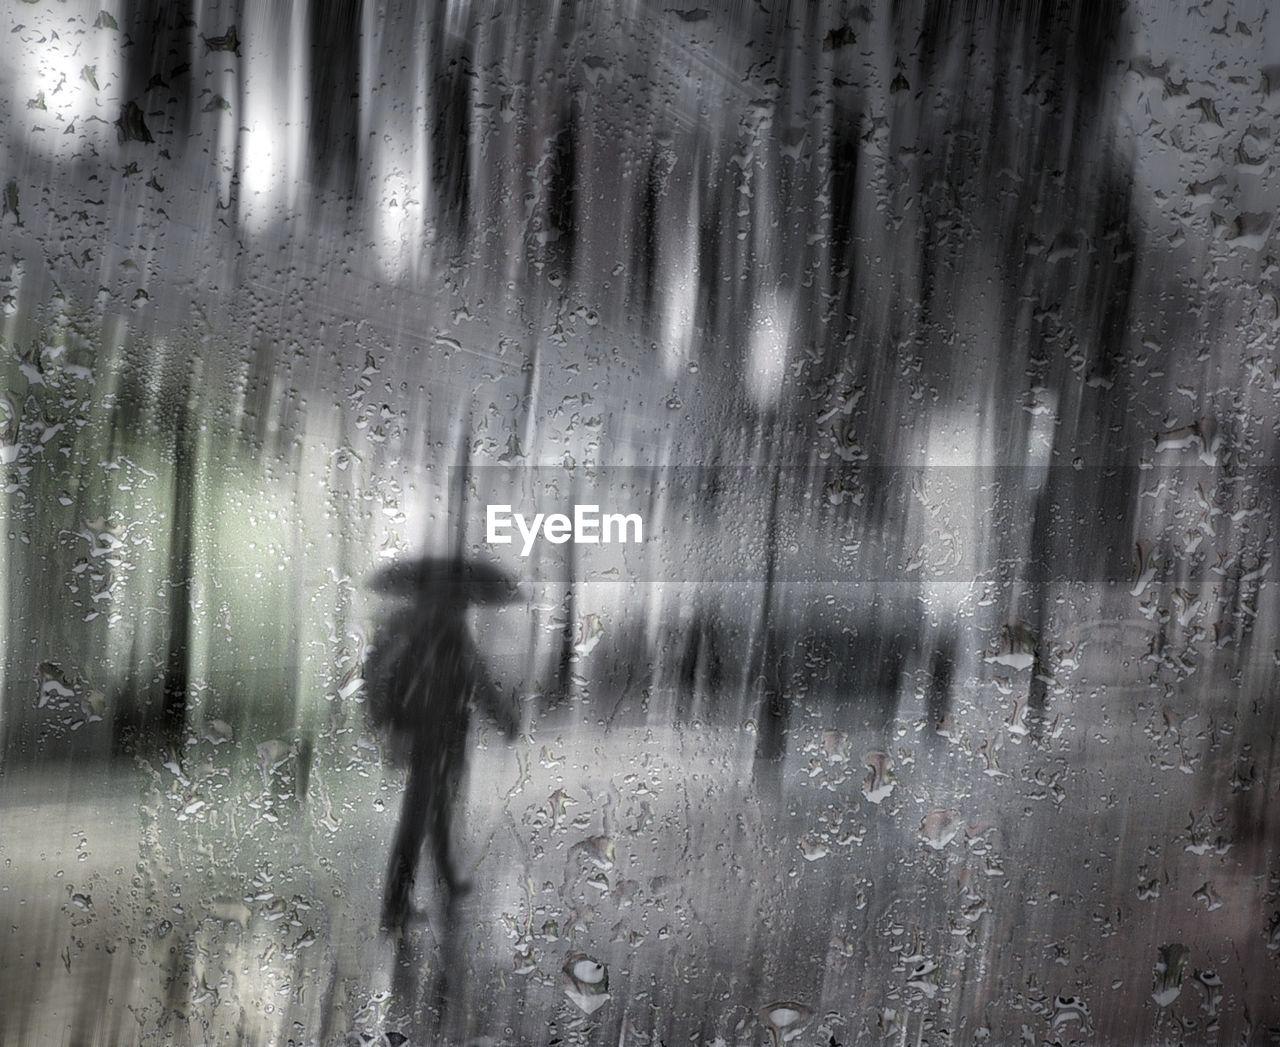 rain, wet, rainy season, weather, drop, raindrop, rainfall, water, window, condensation, day, indoors, full frame, real people, nature, dripping